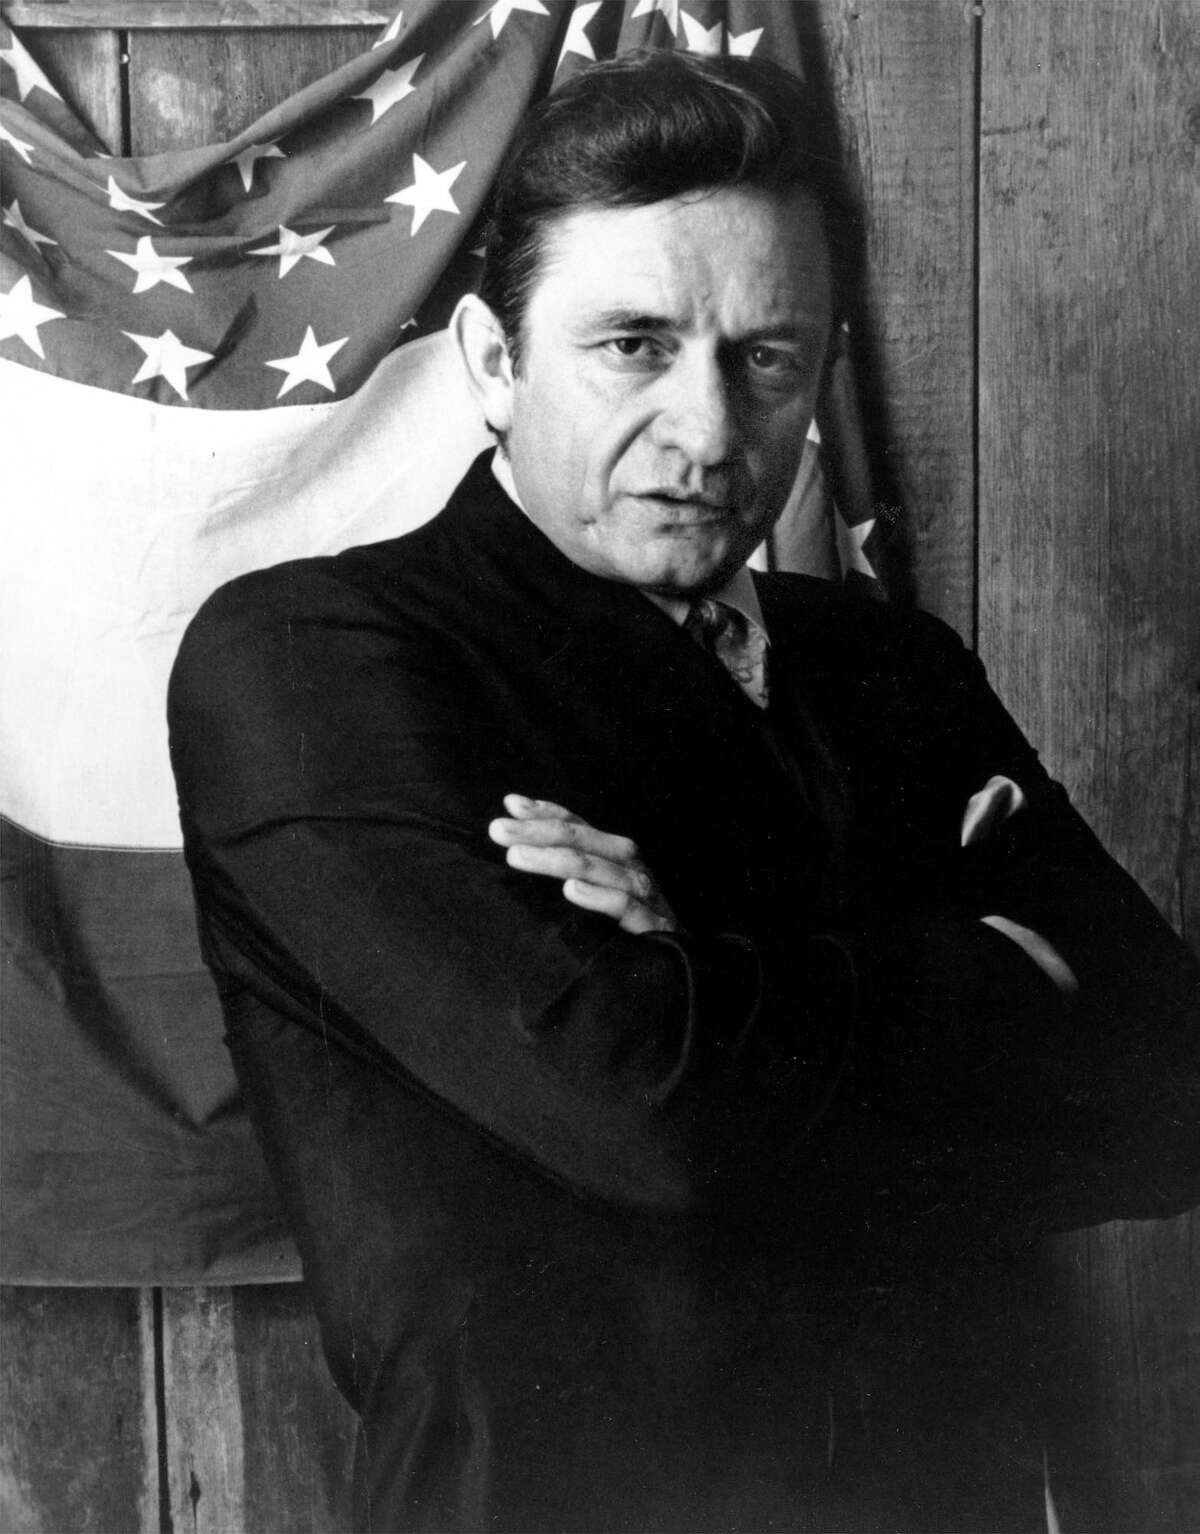 Johnny Cash, 1969